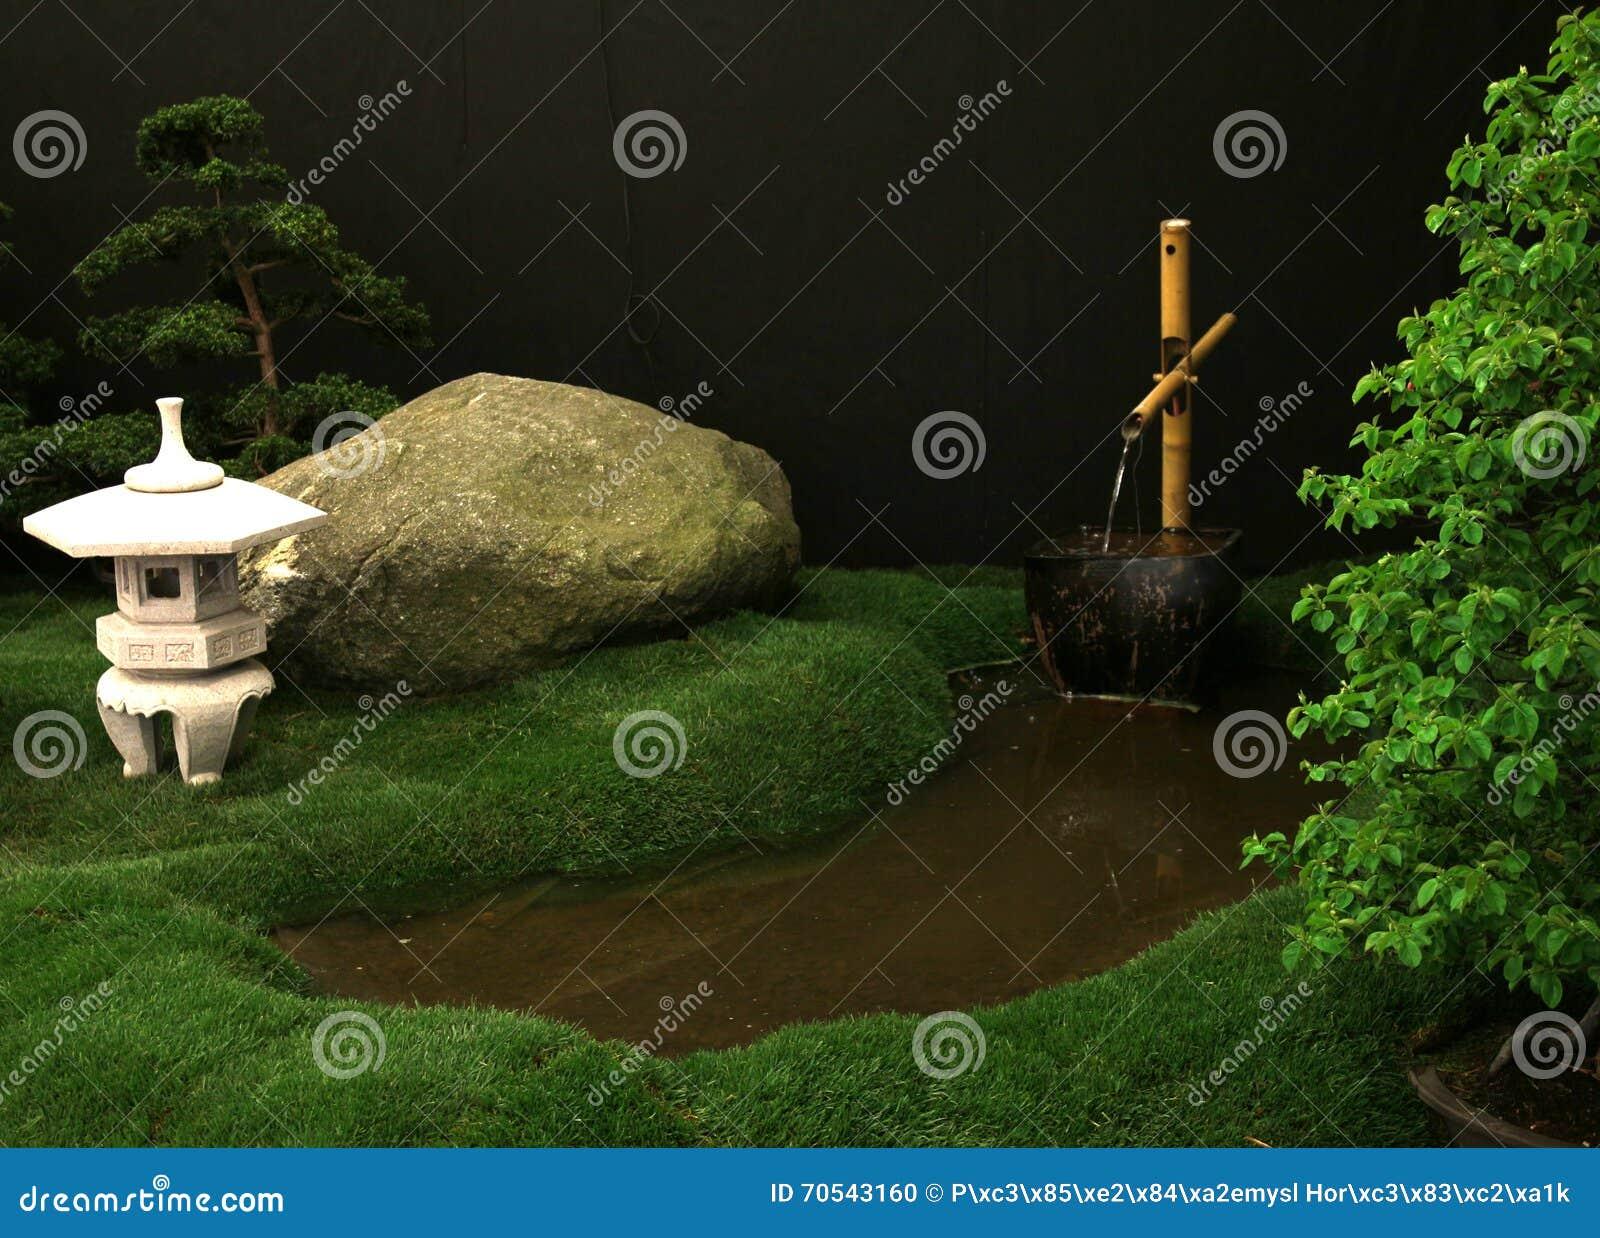 Elegant Download Japanese Garden Decorations Still Life Stock Photo   Image Of  Garden, Gardens: 70543160